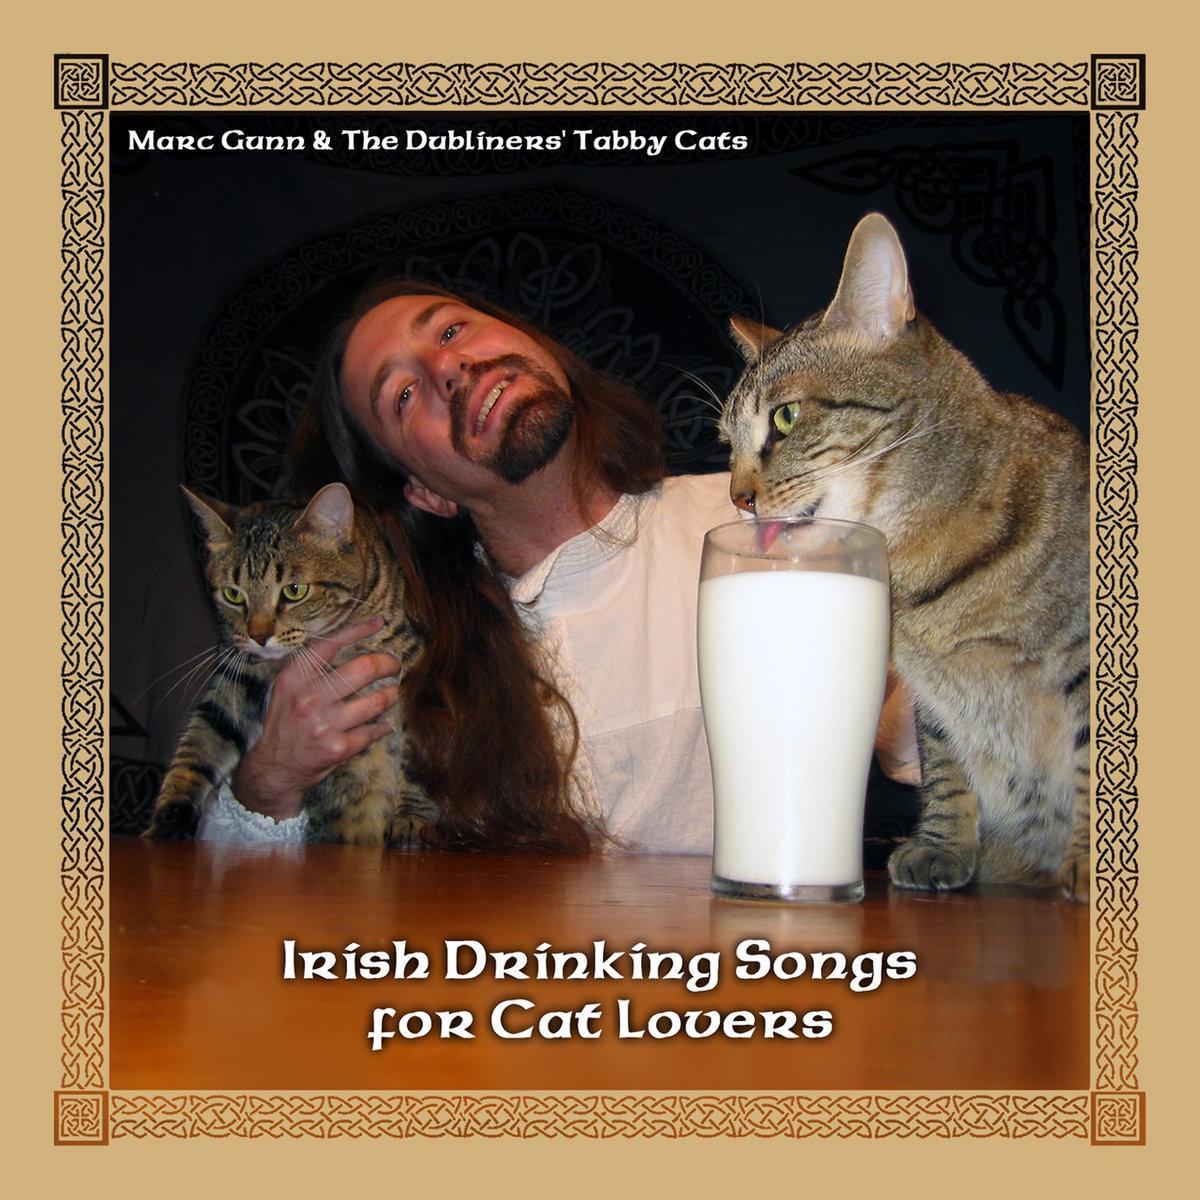 Irish Drinking Songs for Cat Lovers | Marc Gunn